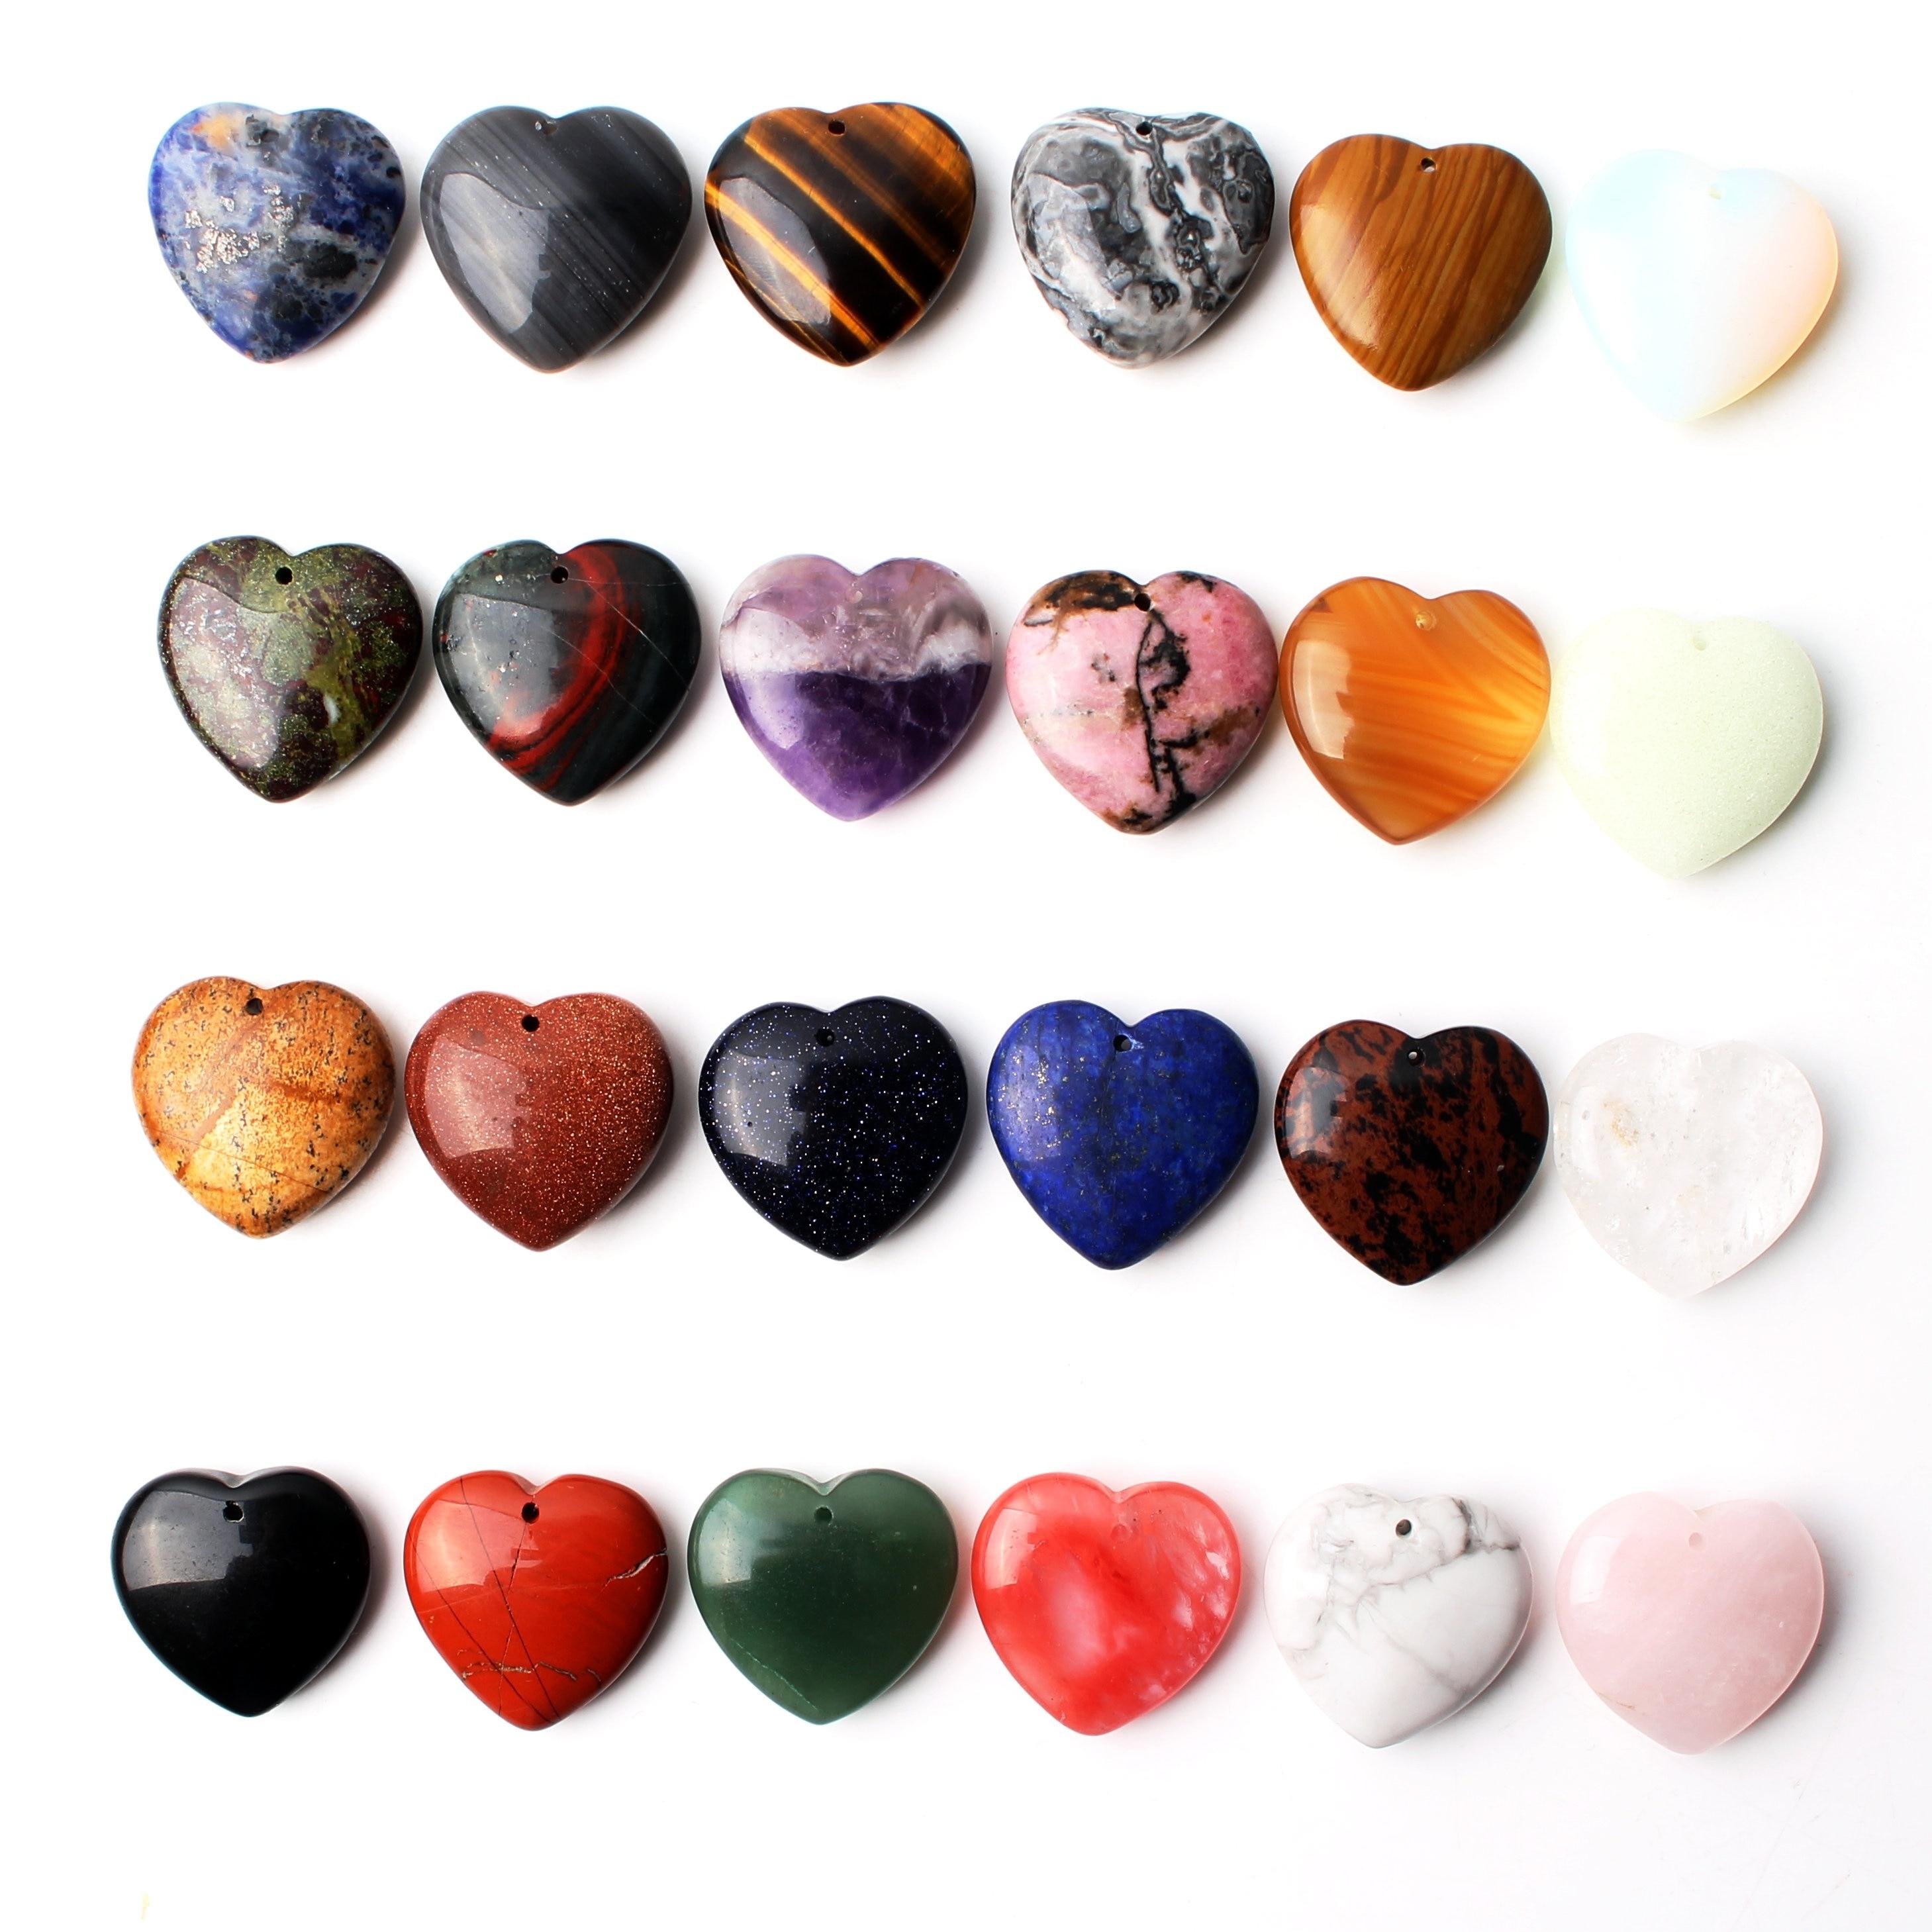 Cristal Natural amatista rosa cuarzo forma de corazón colgante con agujero collar accesorios joyería hacer piedra Reiki curación regalo